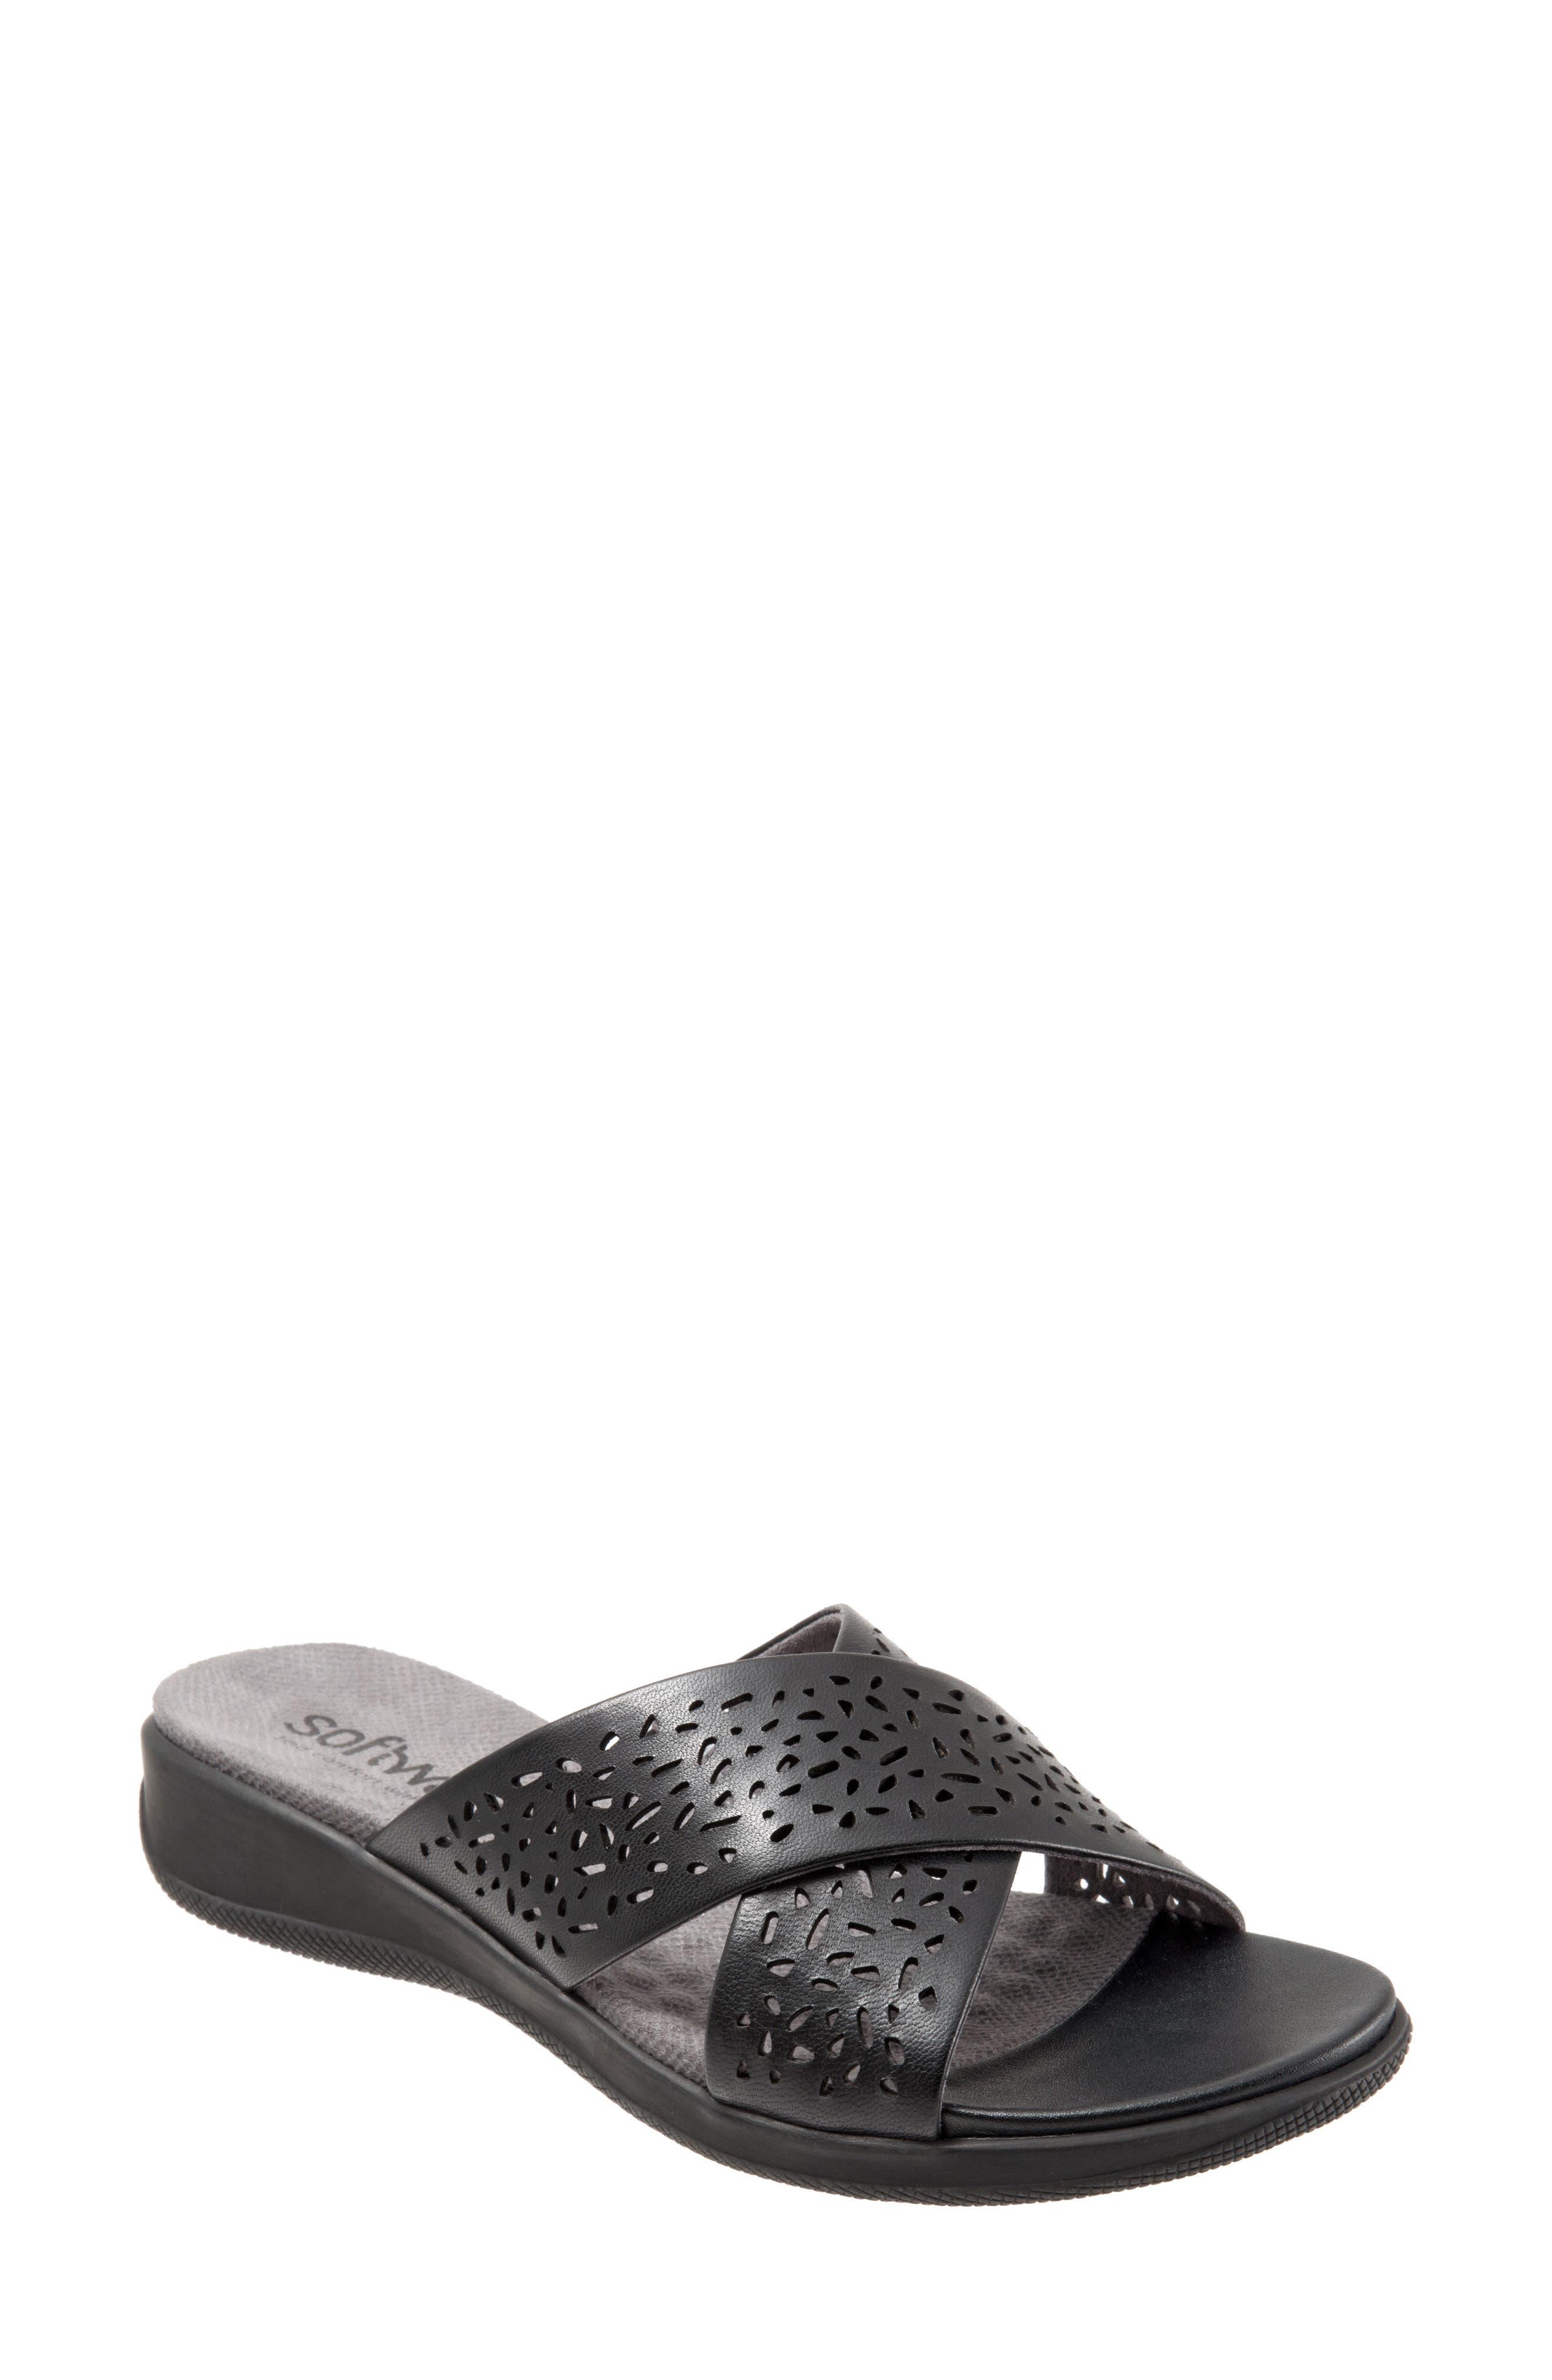 'Tillman' Leather Cross Strap Slide Sandal,                         Main,                         color, 006